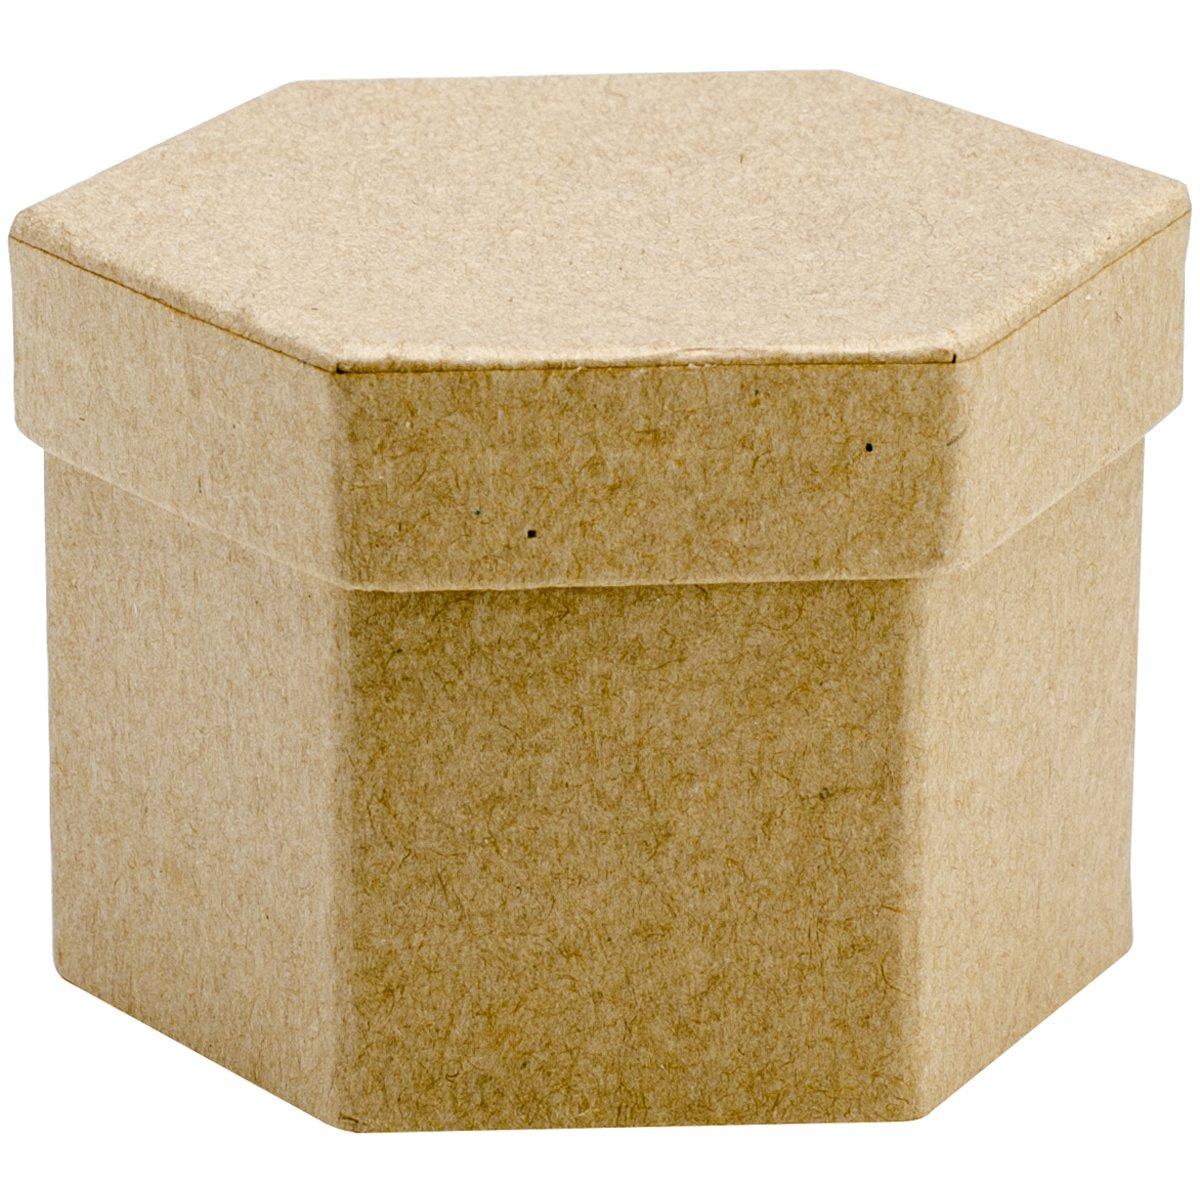 Creativity Street Paper-Mache Boxes Classpack 24Pc Assortment-2-inch 6449